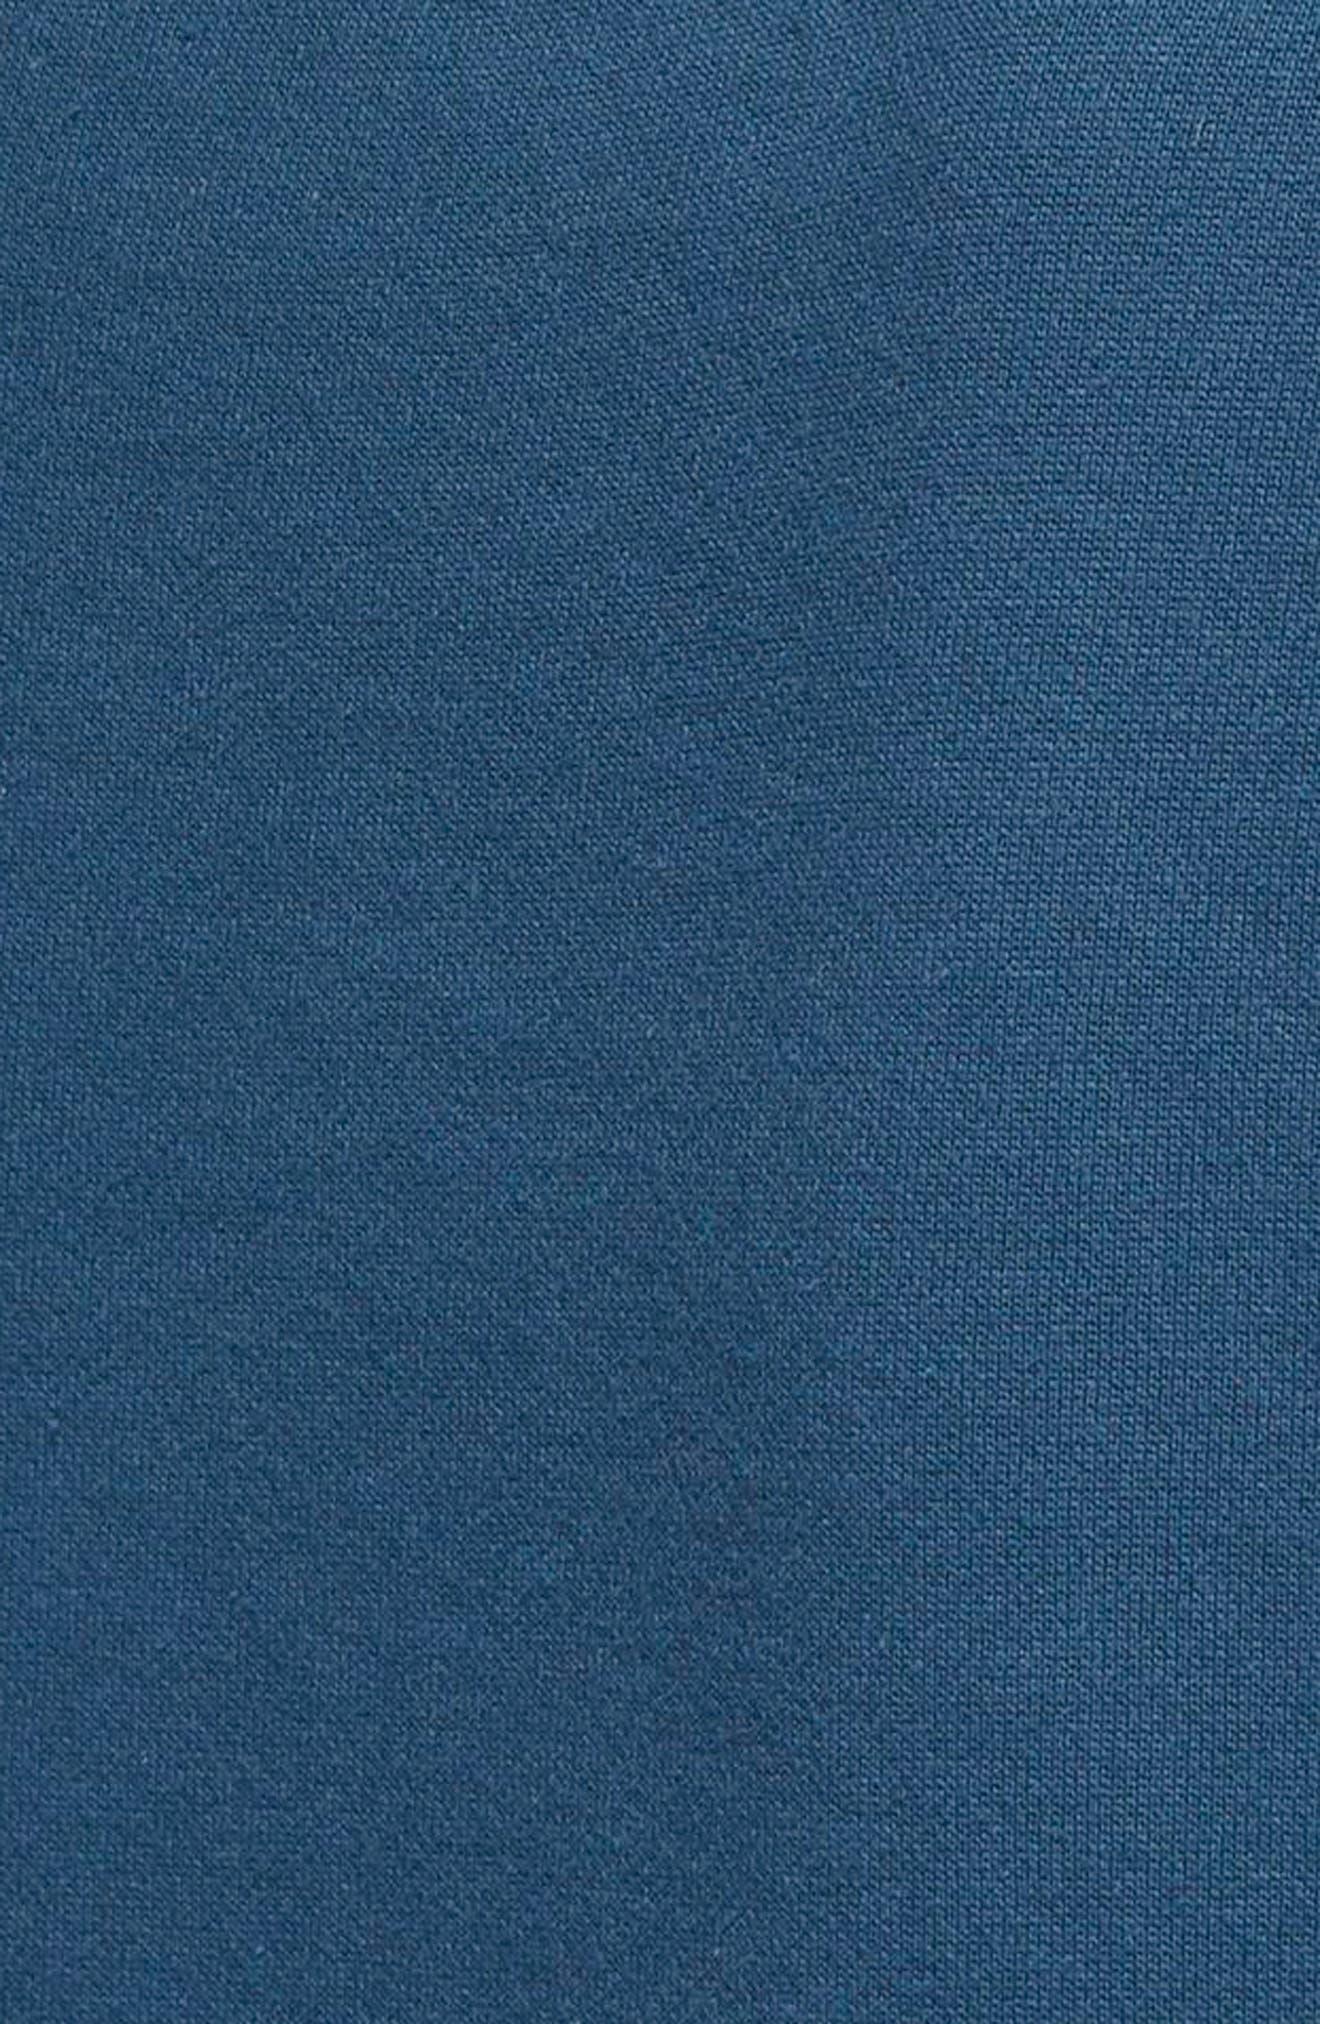 Originals Oversize Sweatshirt,                             Alternate thumbnail 6, color,                             020